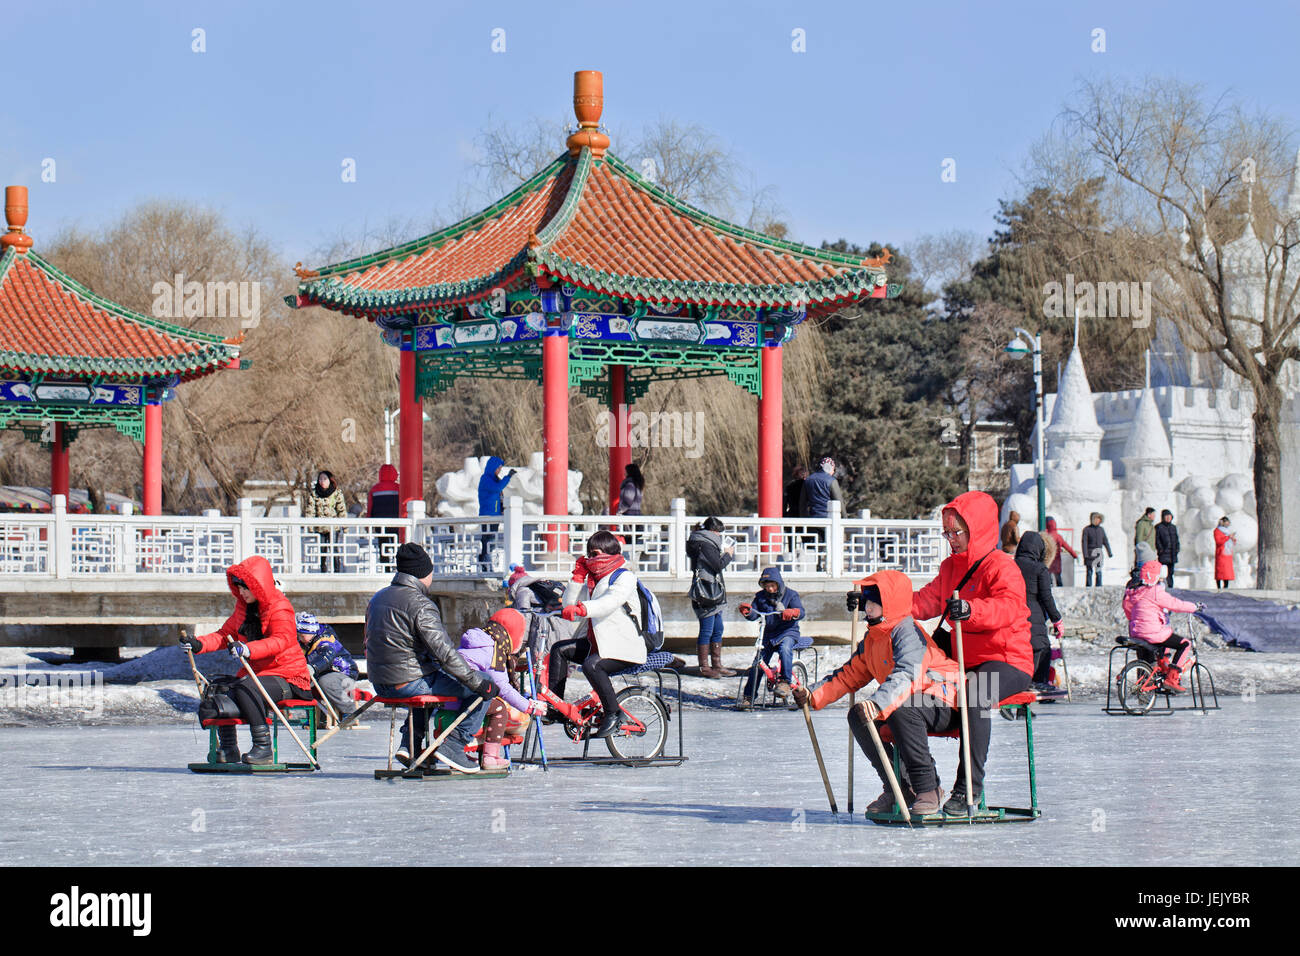 CHANGCHUN – FEB. 4, 2014. People have fun on the ice in Nanhu Park Changchun, capital of northeast Jilin Province. - Stock Image